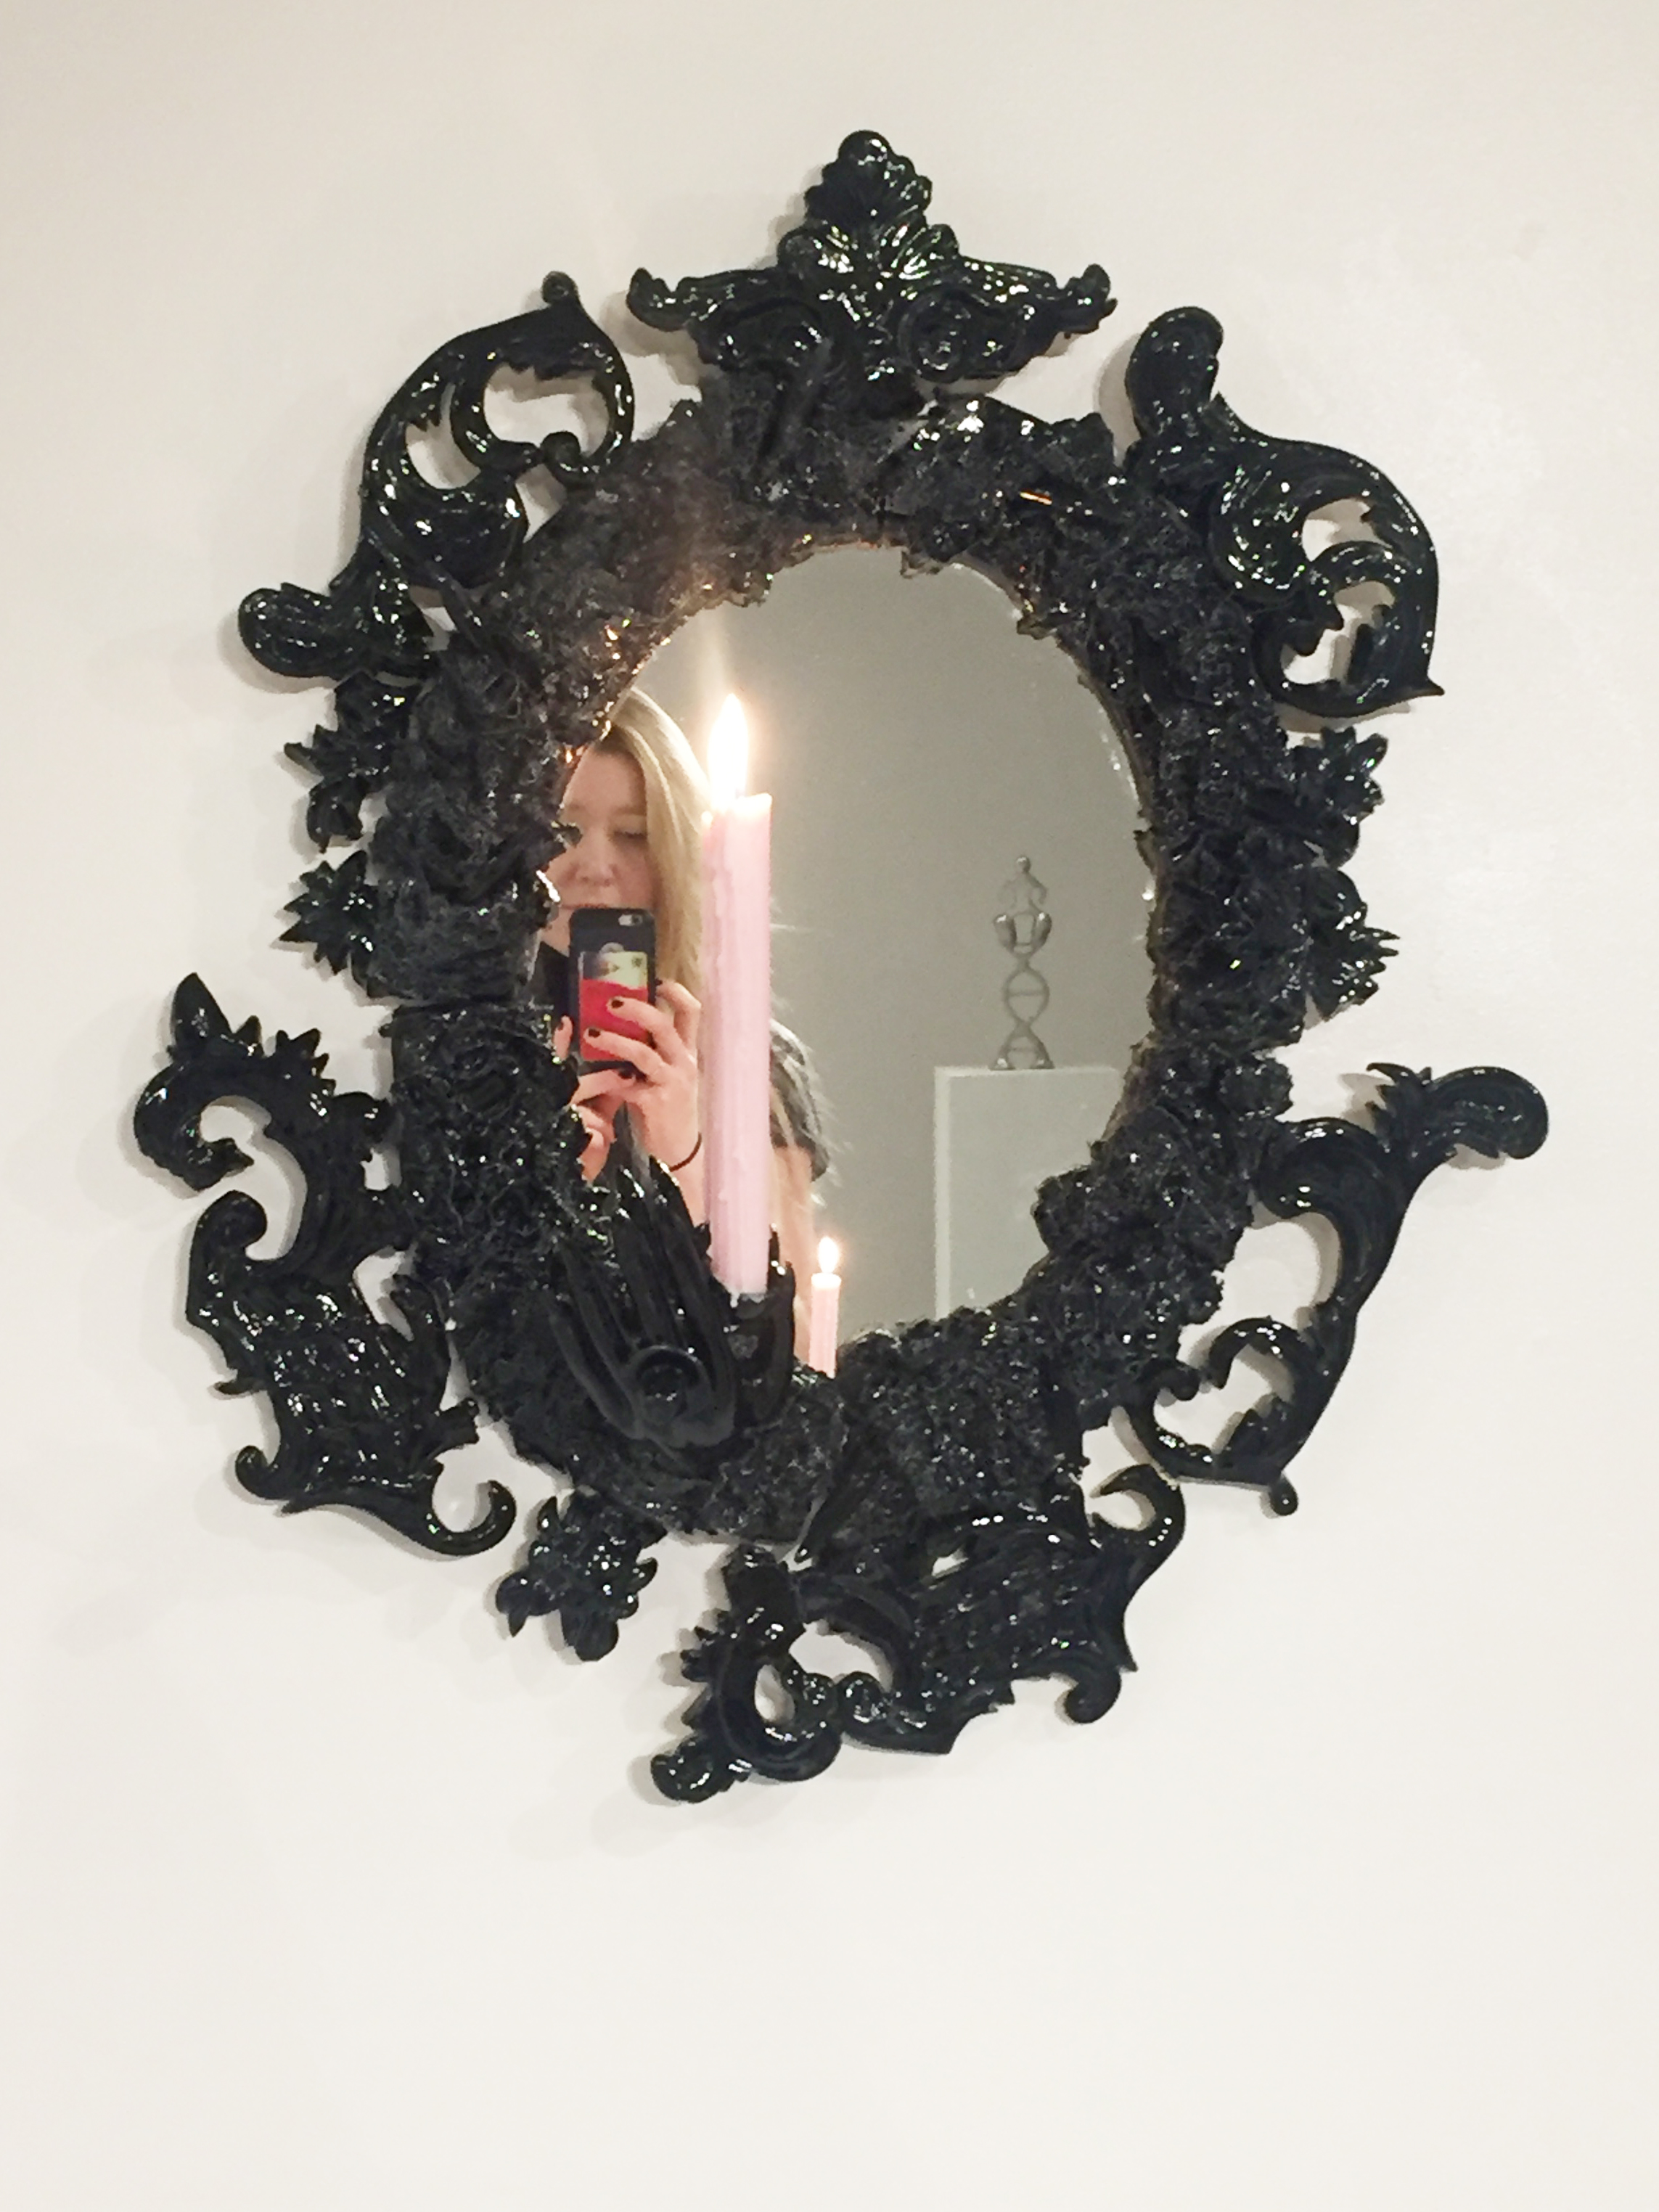 black mirror.jpg